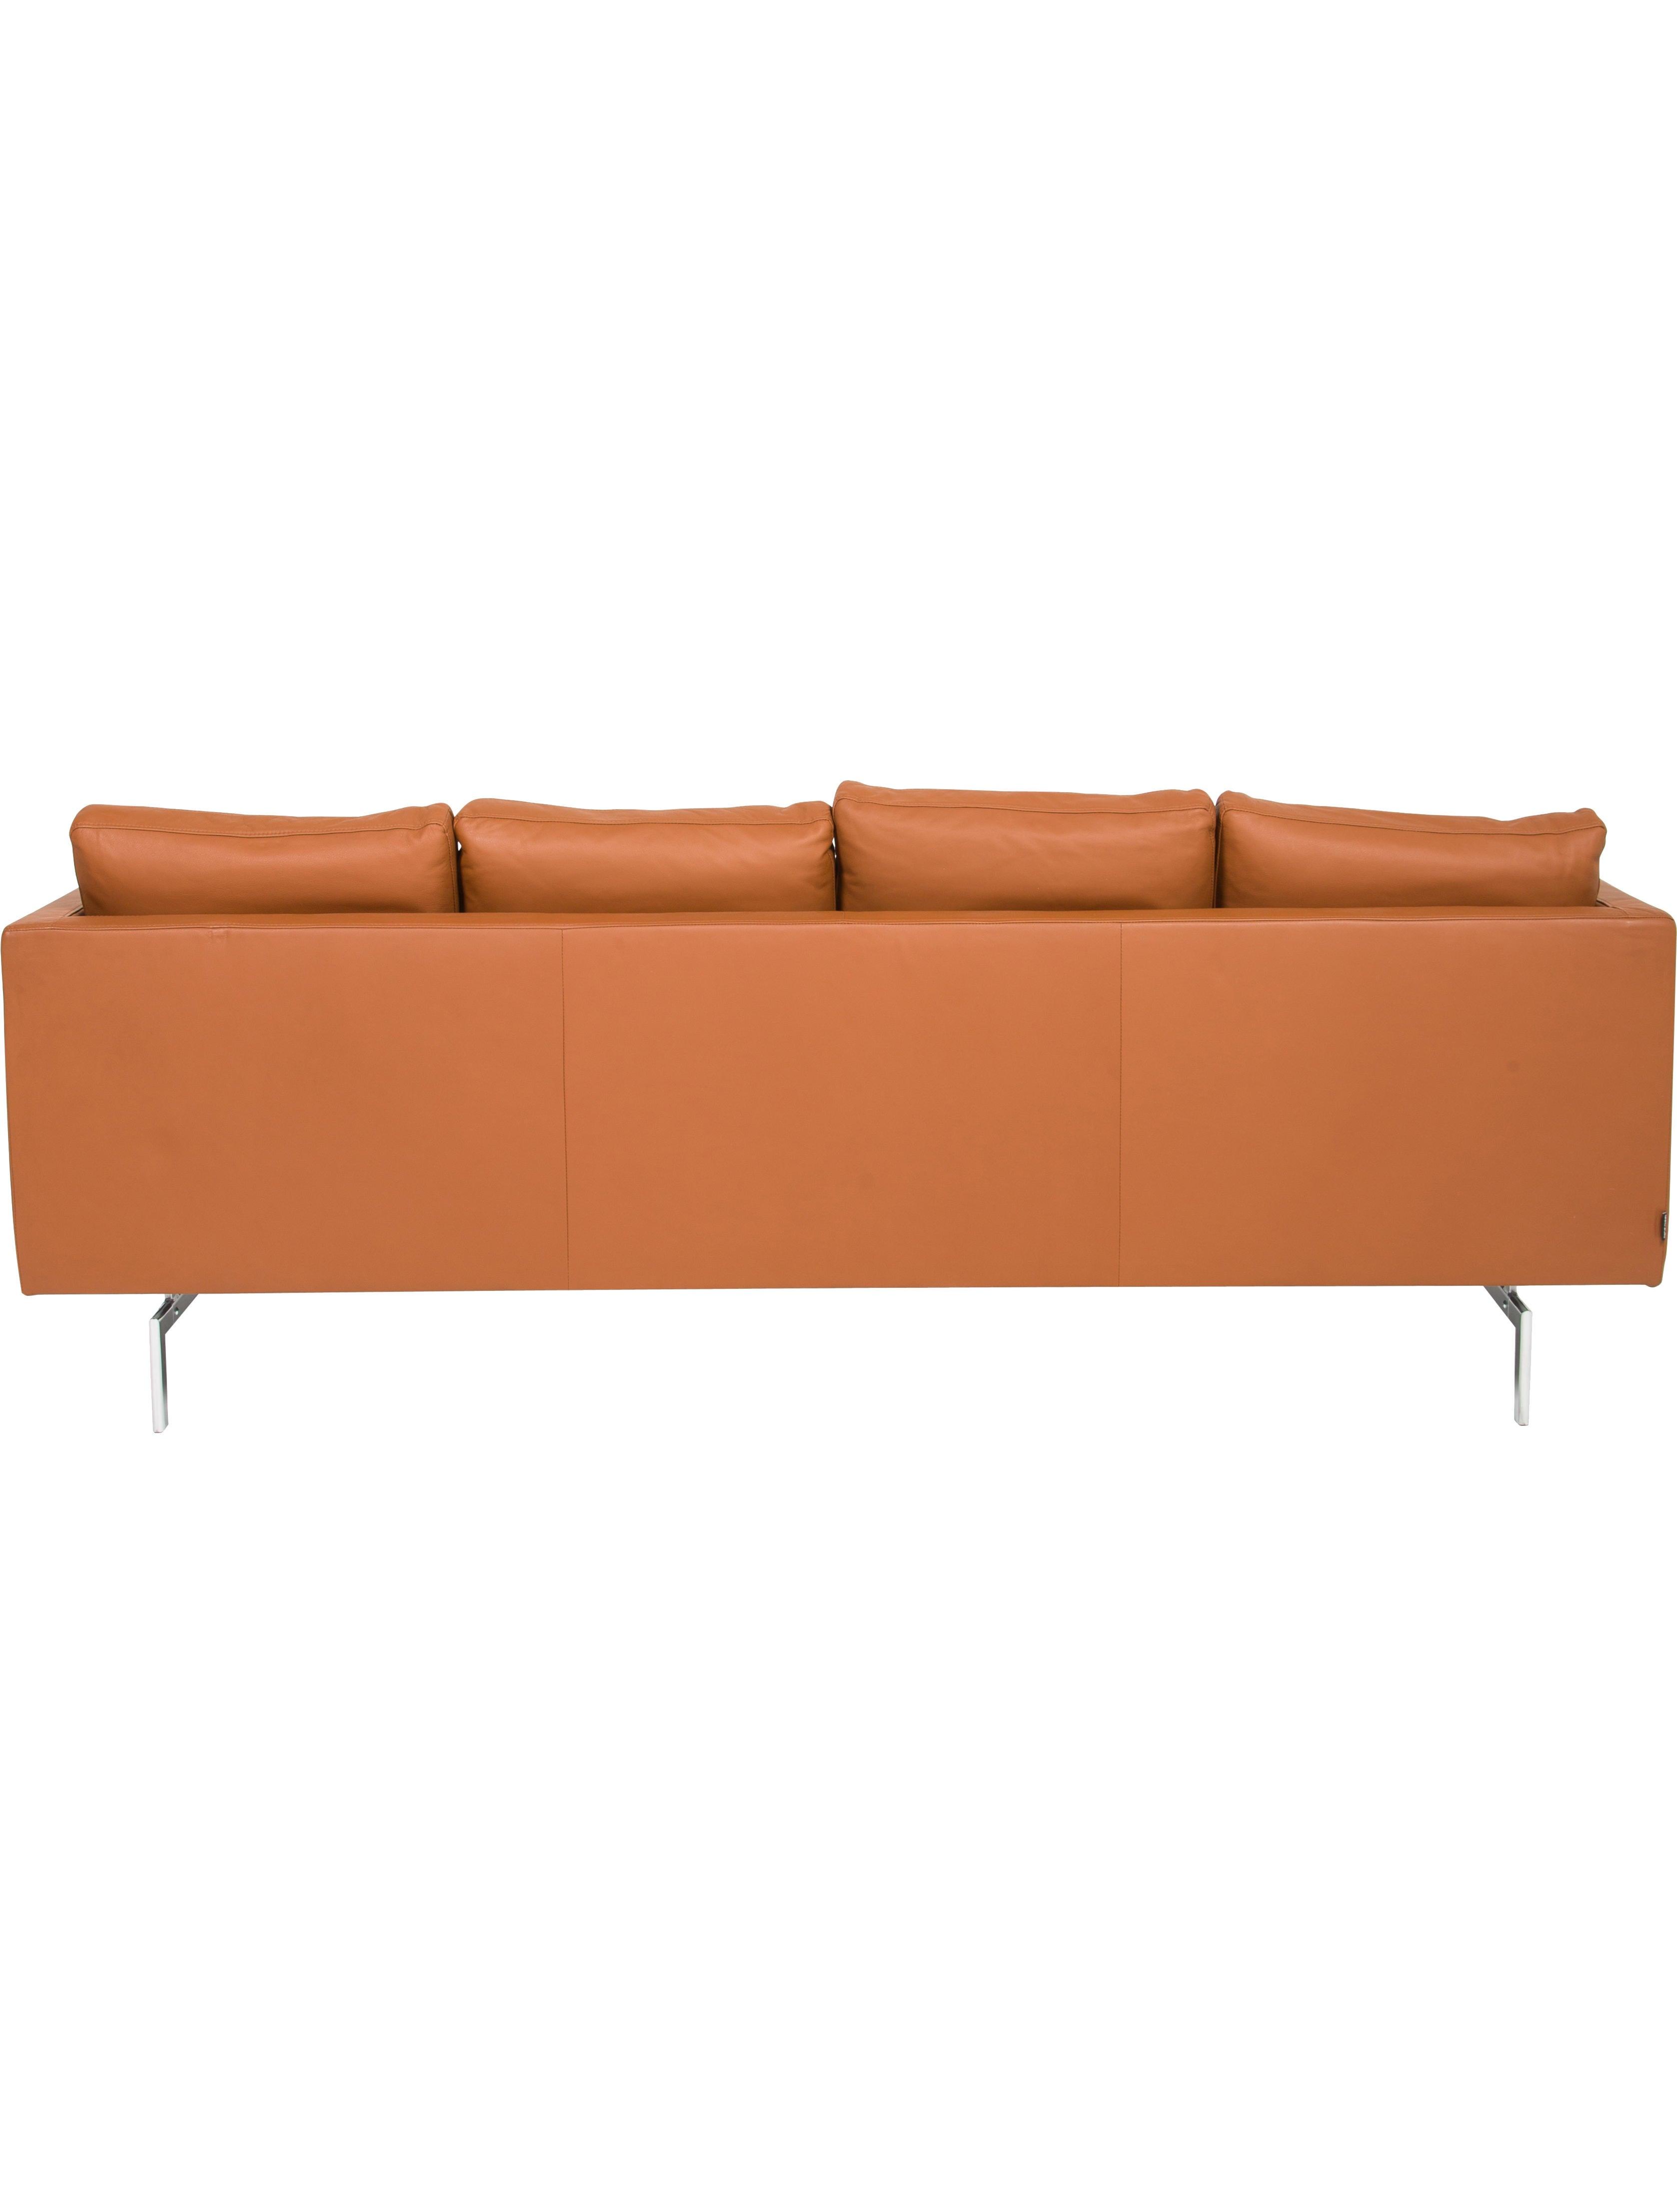 Stricto Sensu Leather Sofa